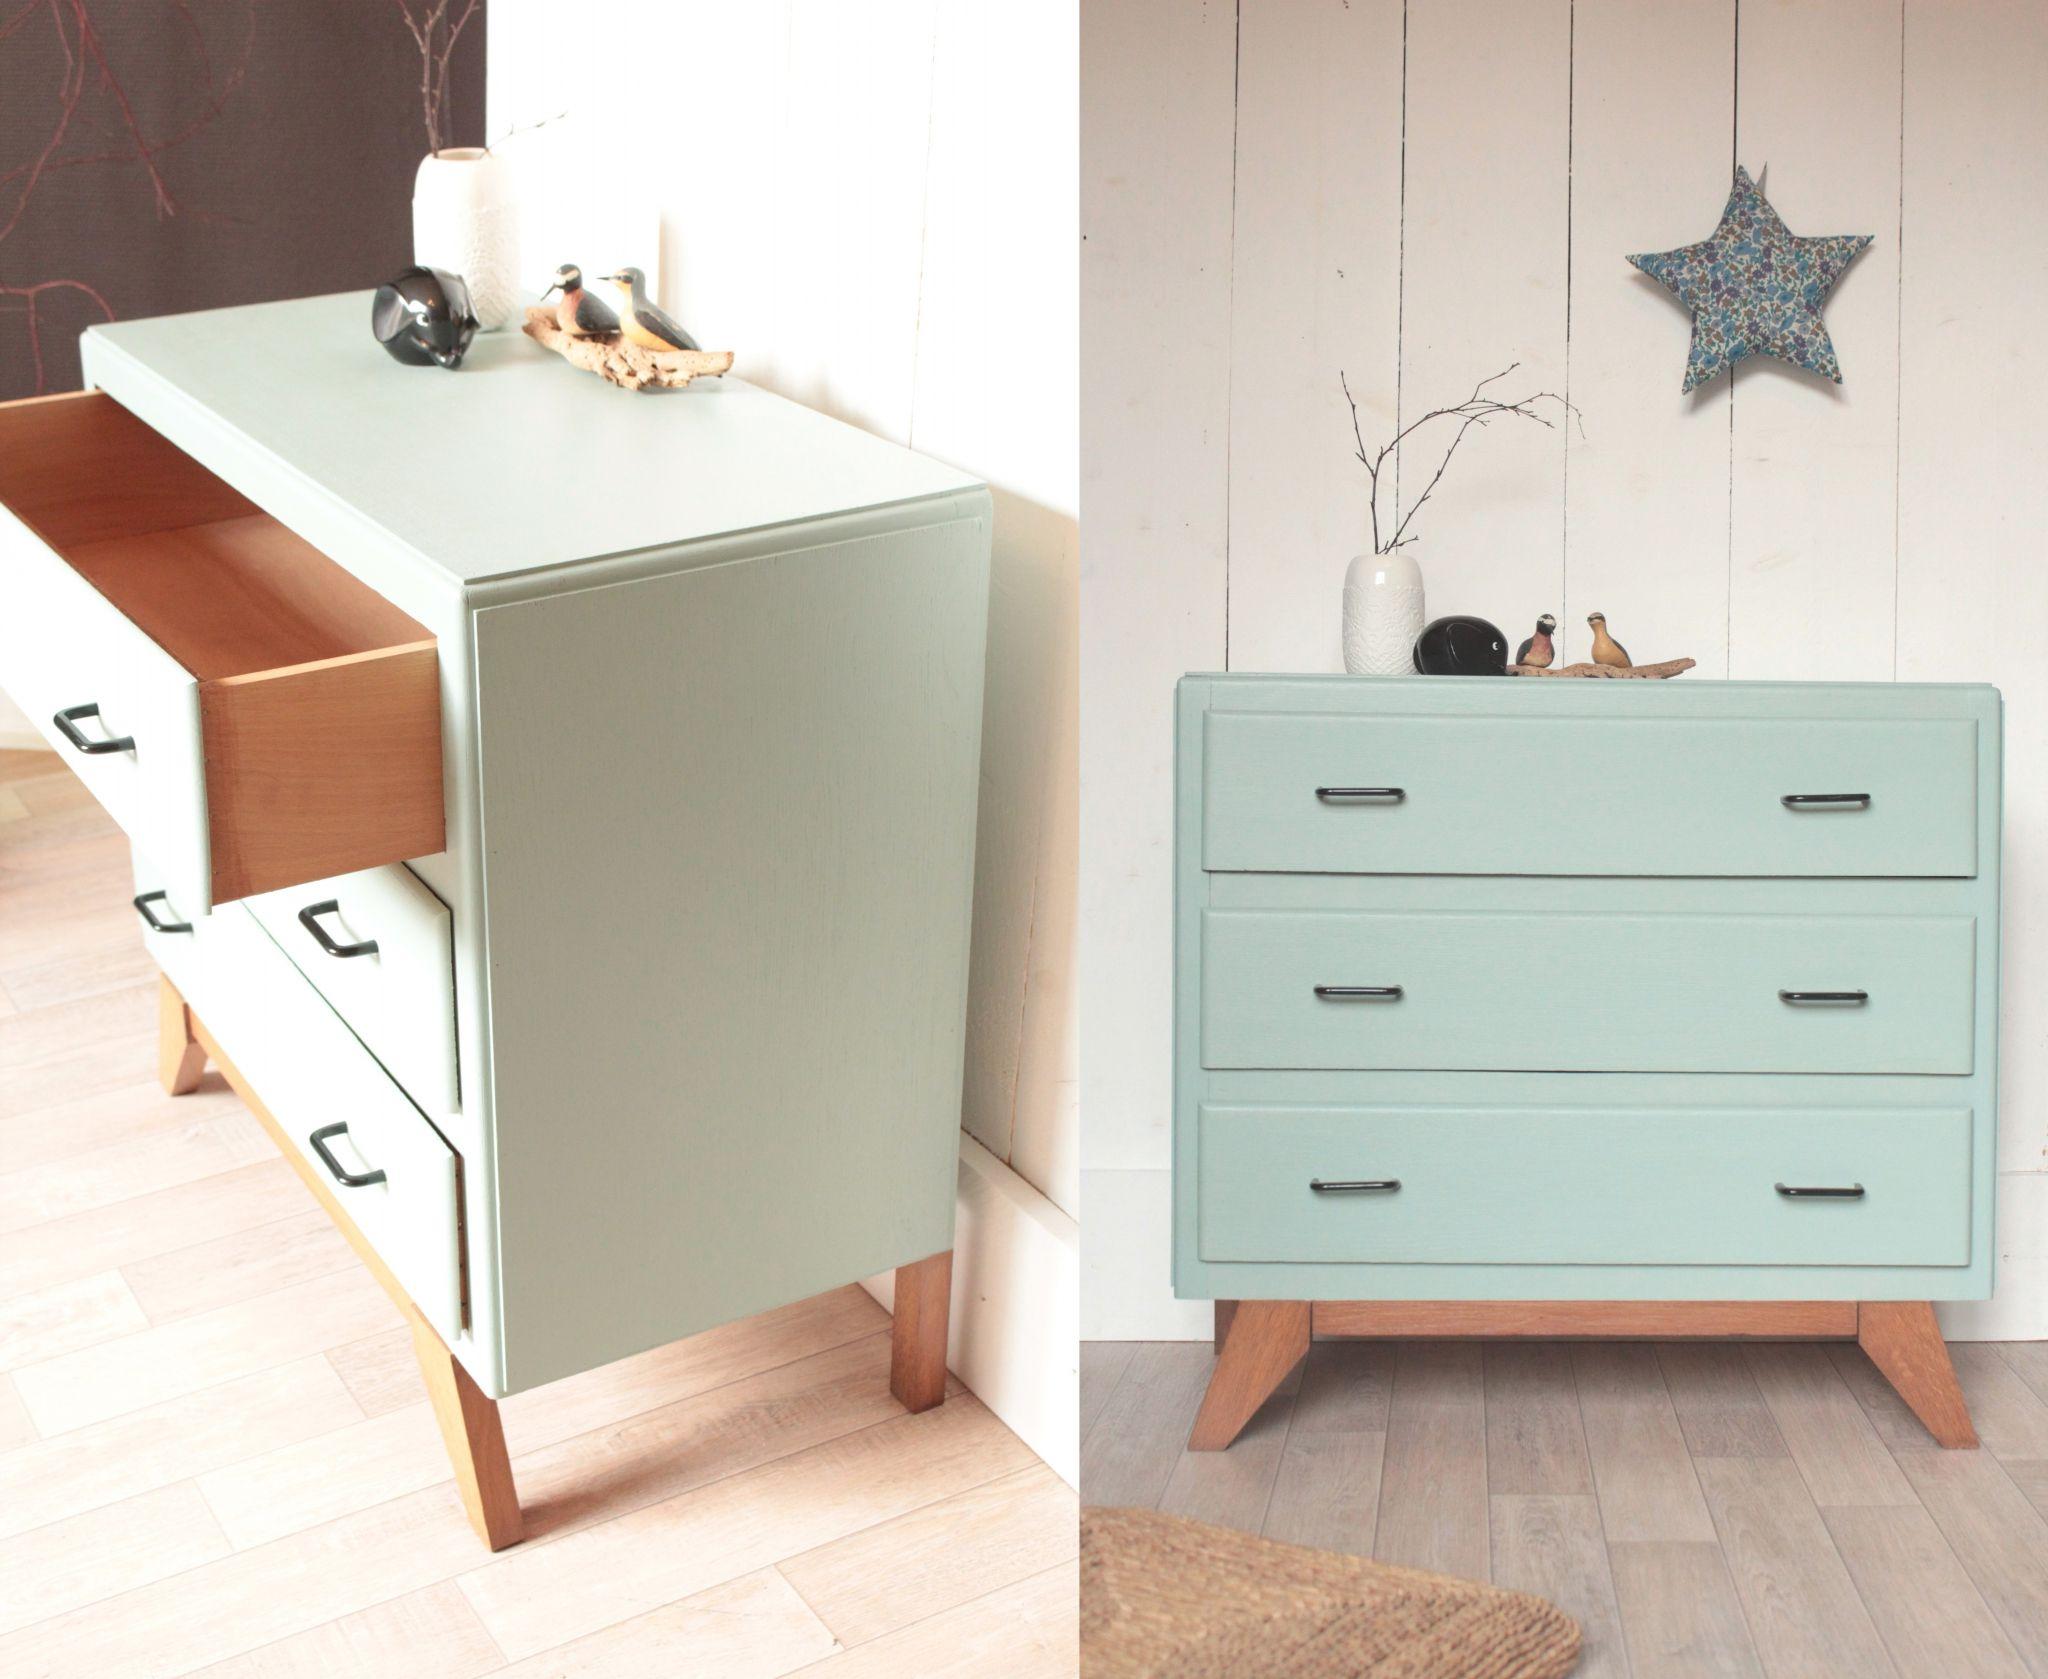 commode ann es 50 bleu clair pi tement ch ne trendy little2 meubles pinterest commode. Black Bedroom Furniture Sets. Home Design Ideas